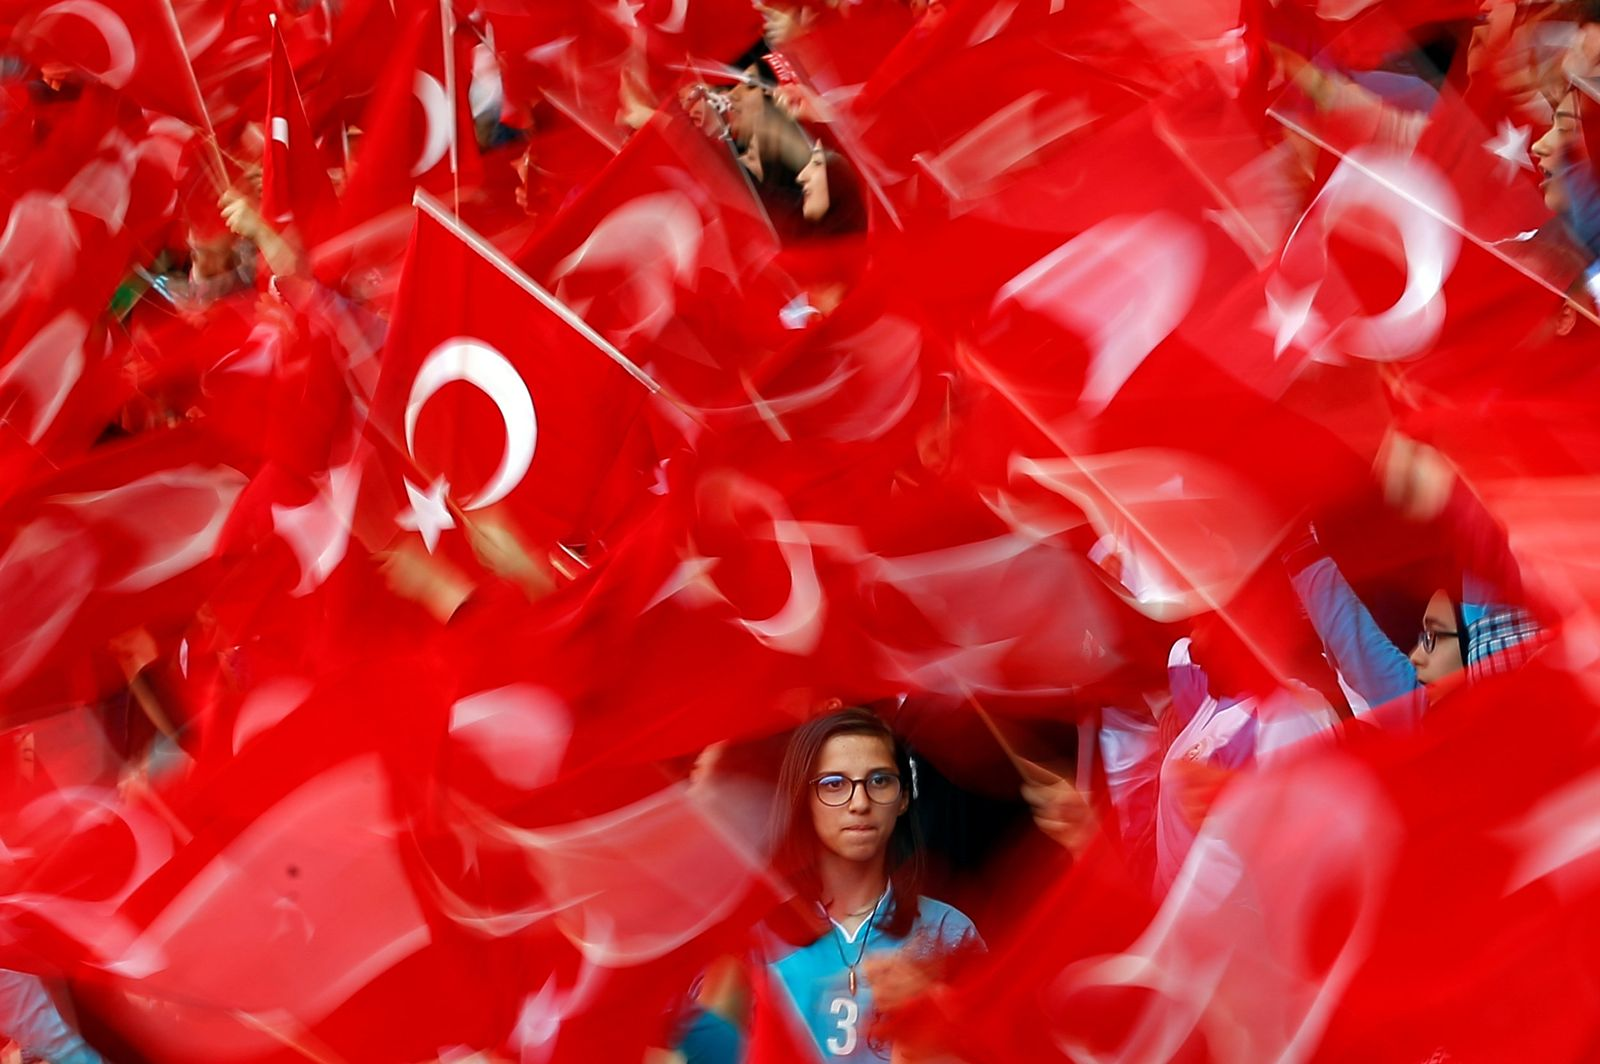 Türkei / Schüler / Imam-Hatip-Schule